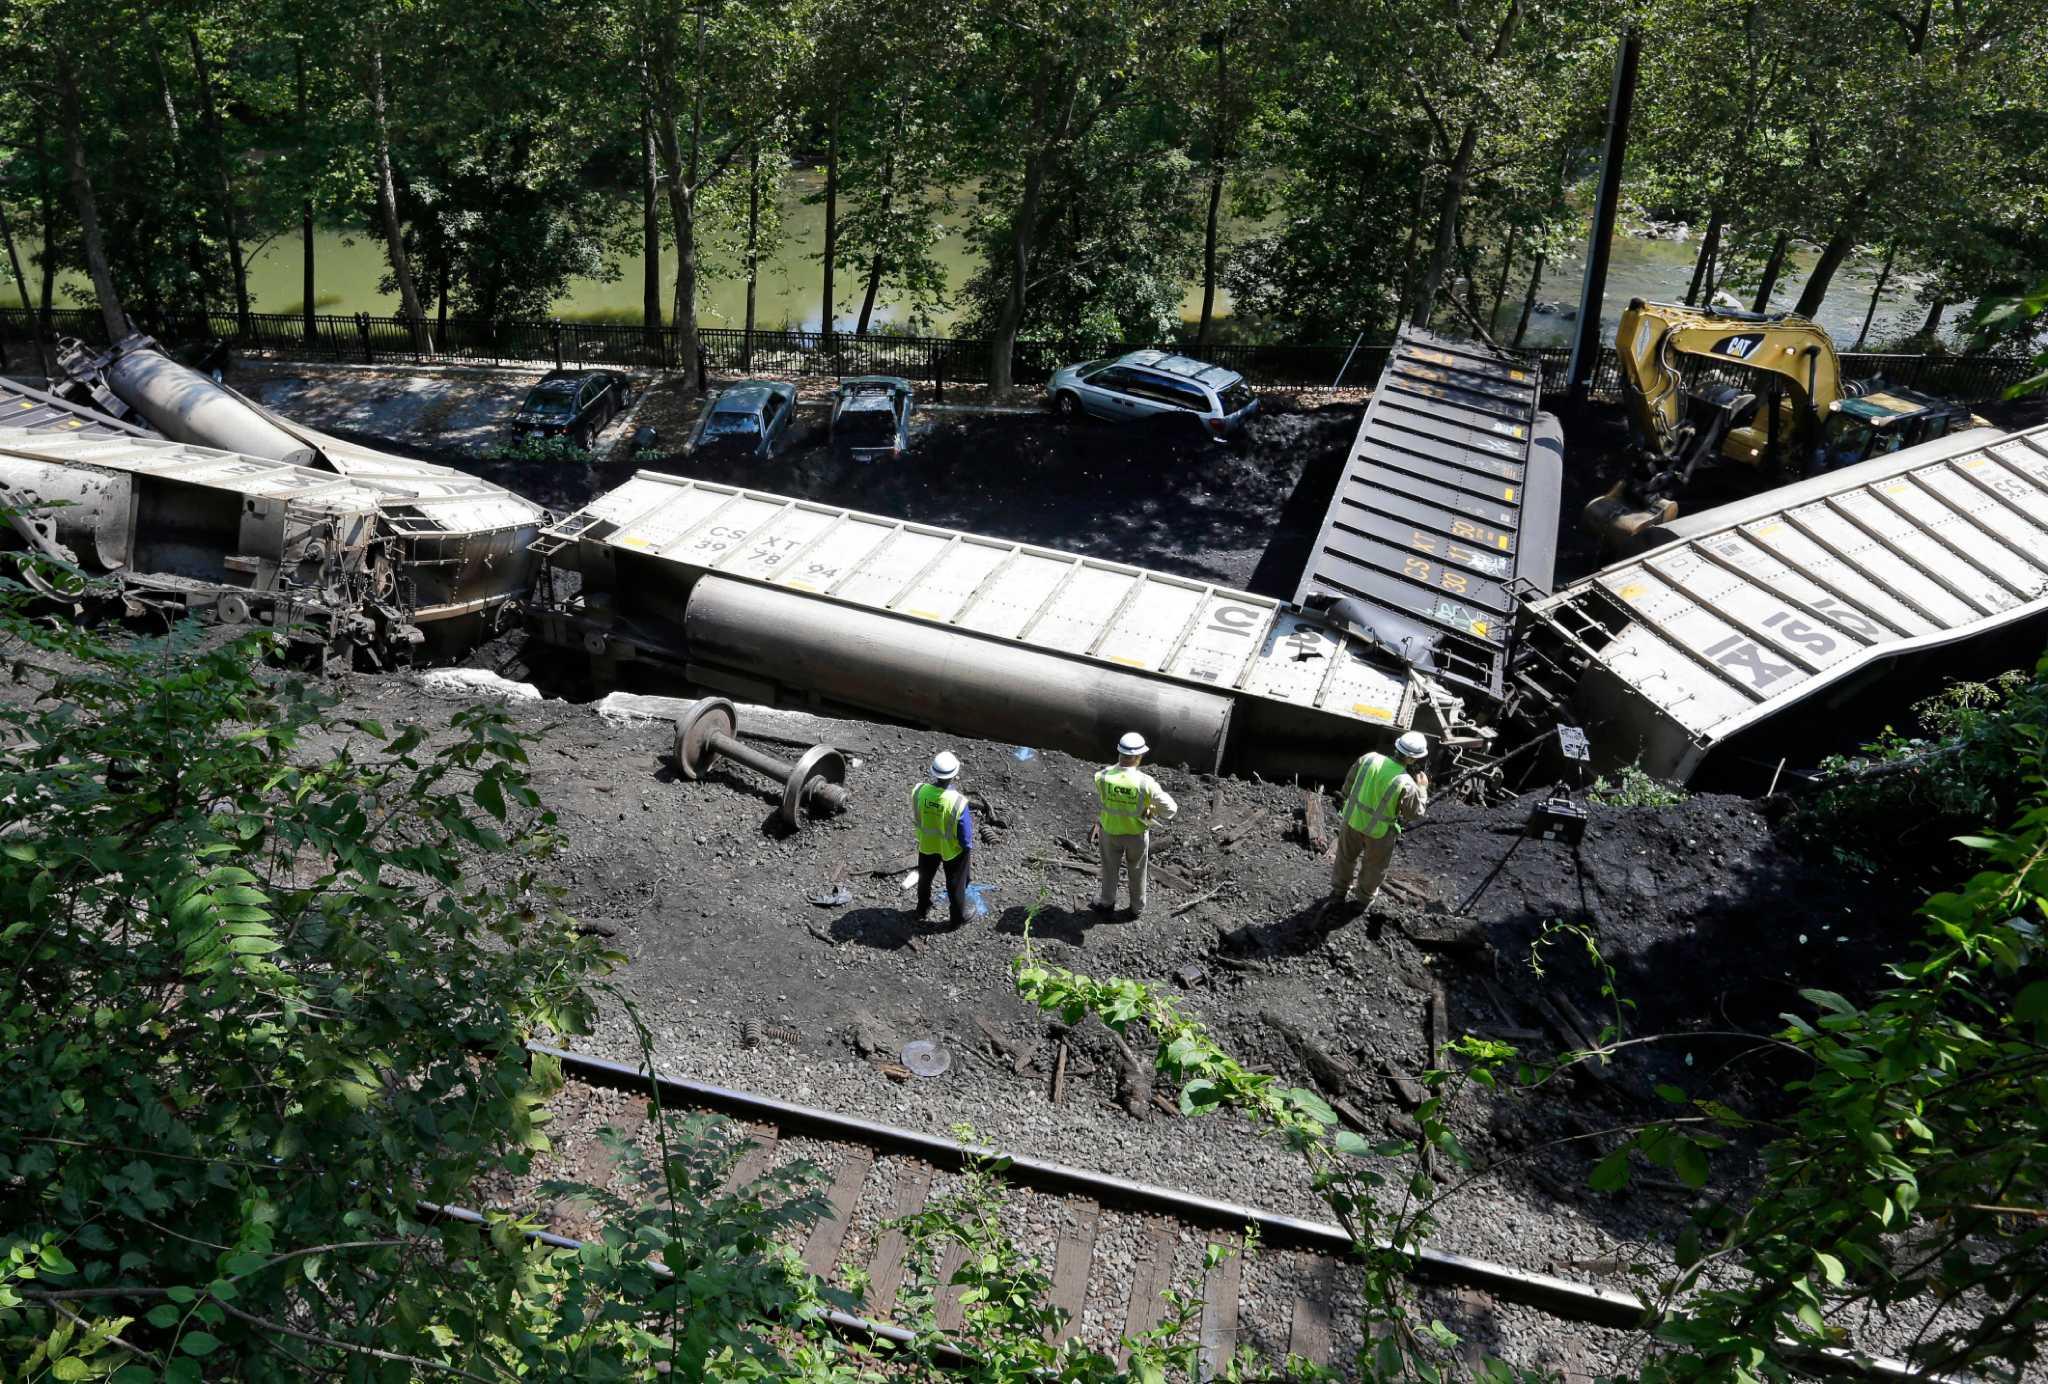 Investigators eye girls' roles in fatal train crash - Times